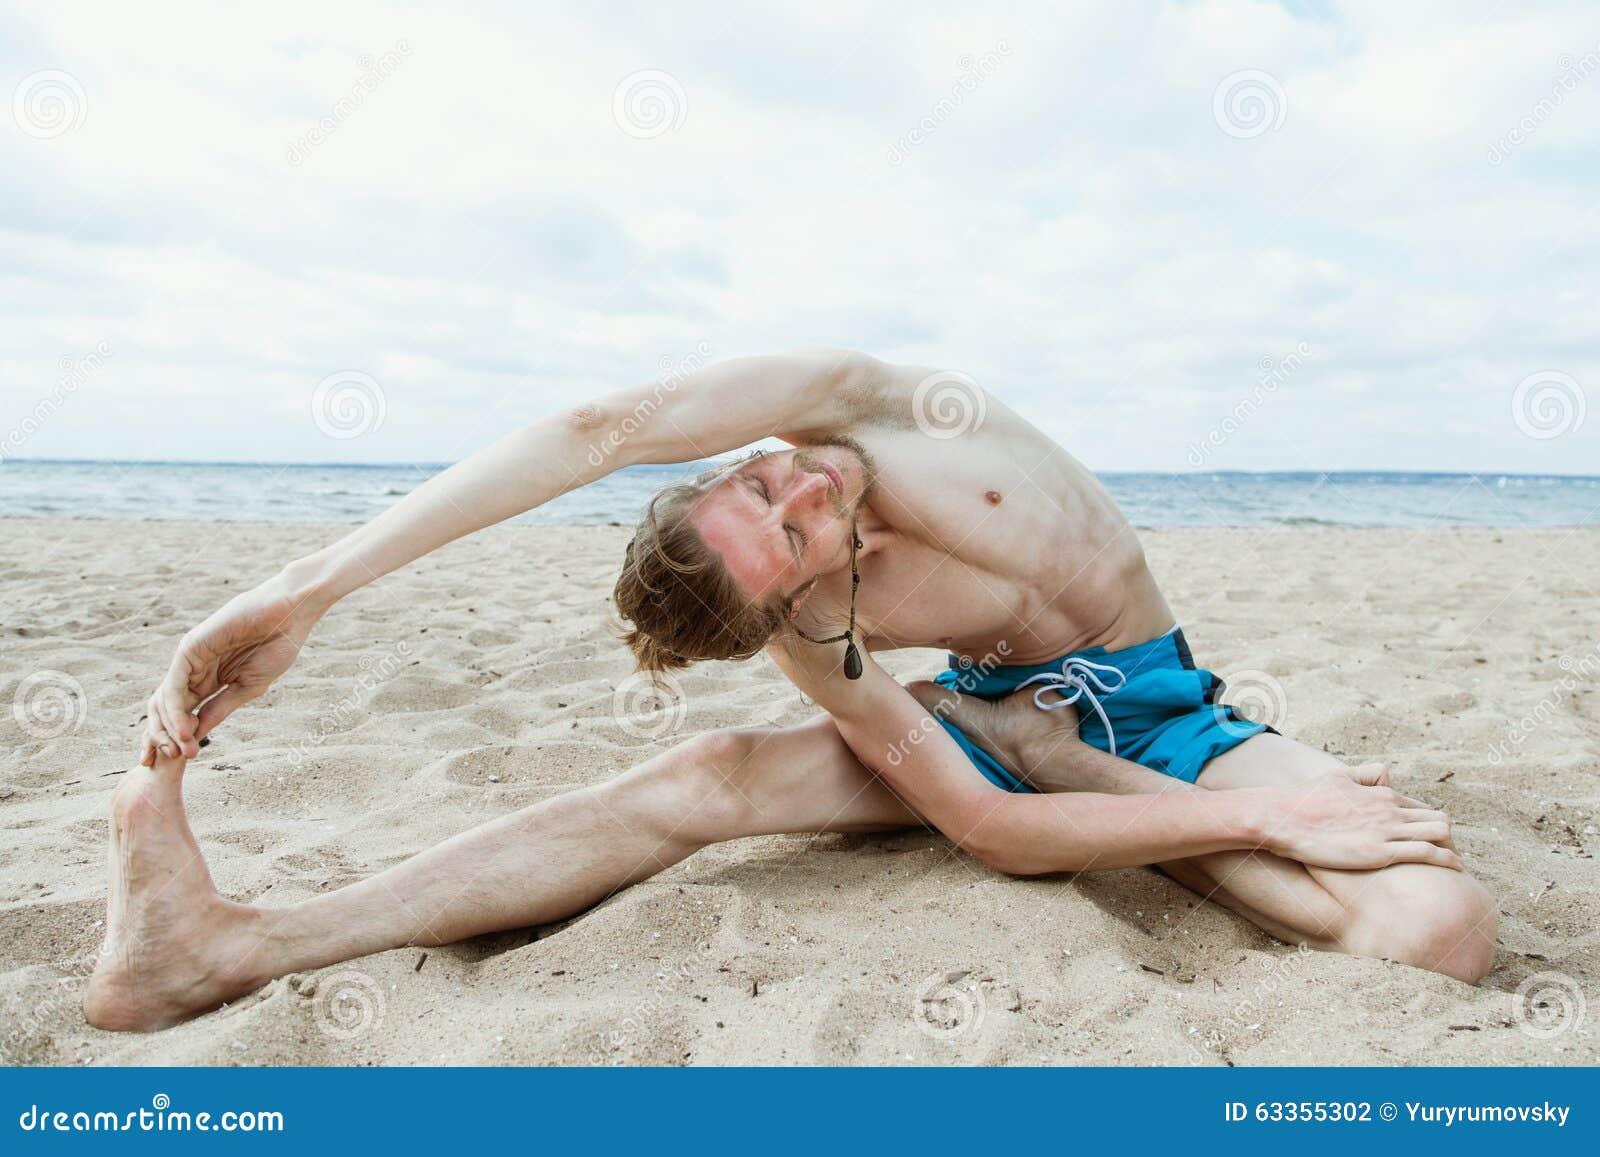 Naked yoga on beach phrase